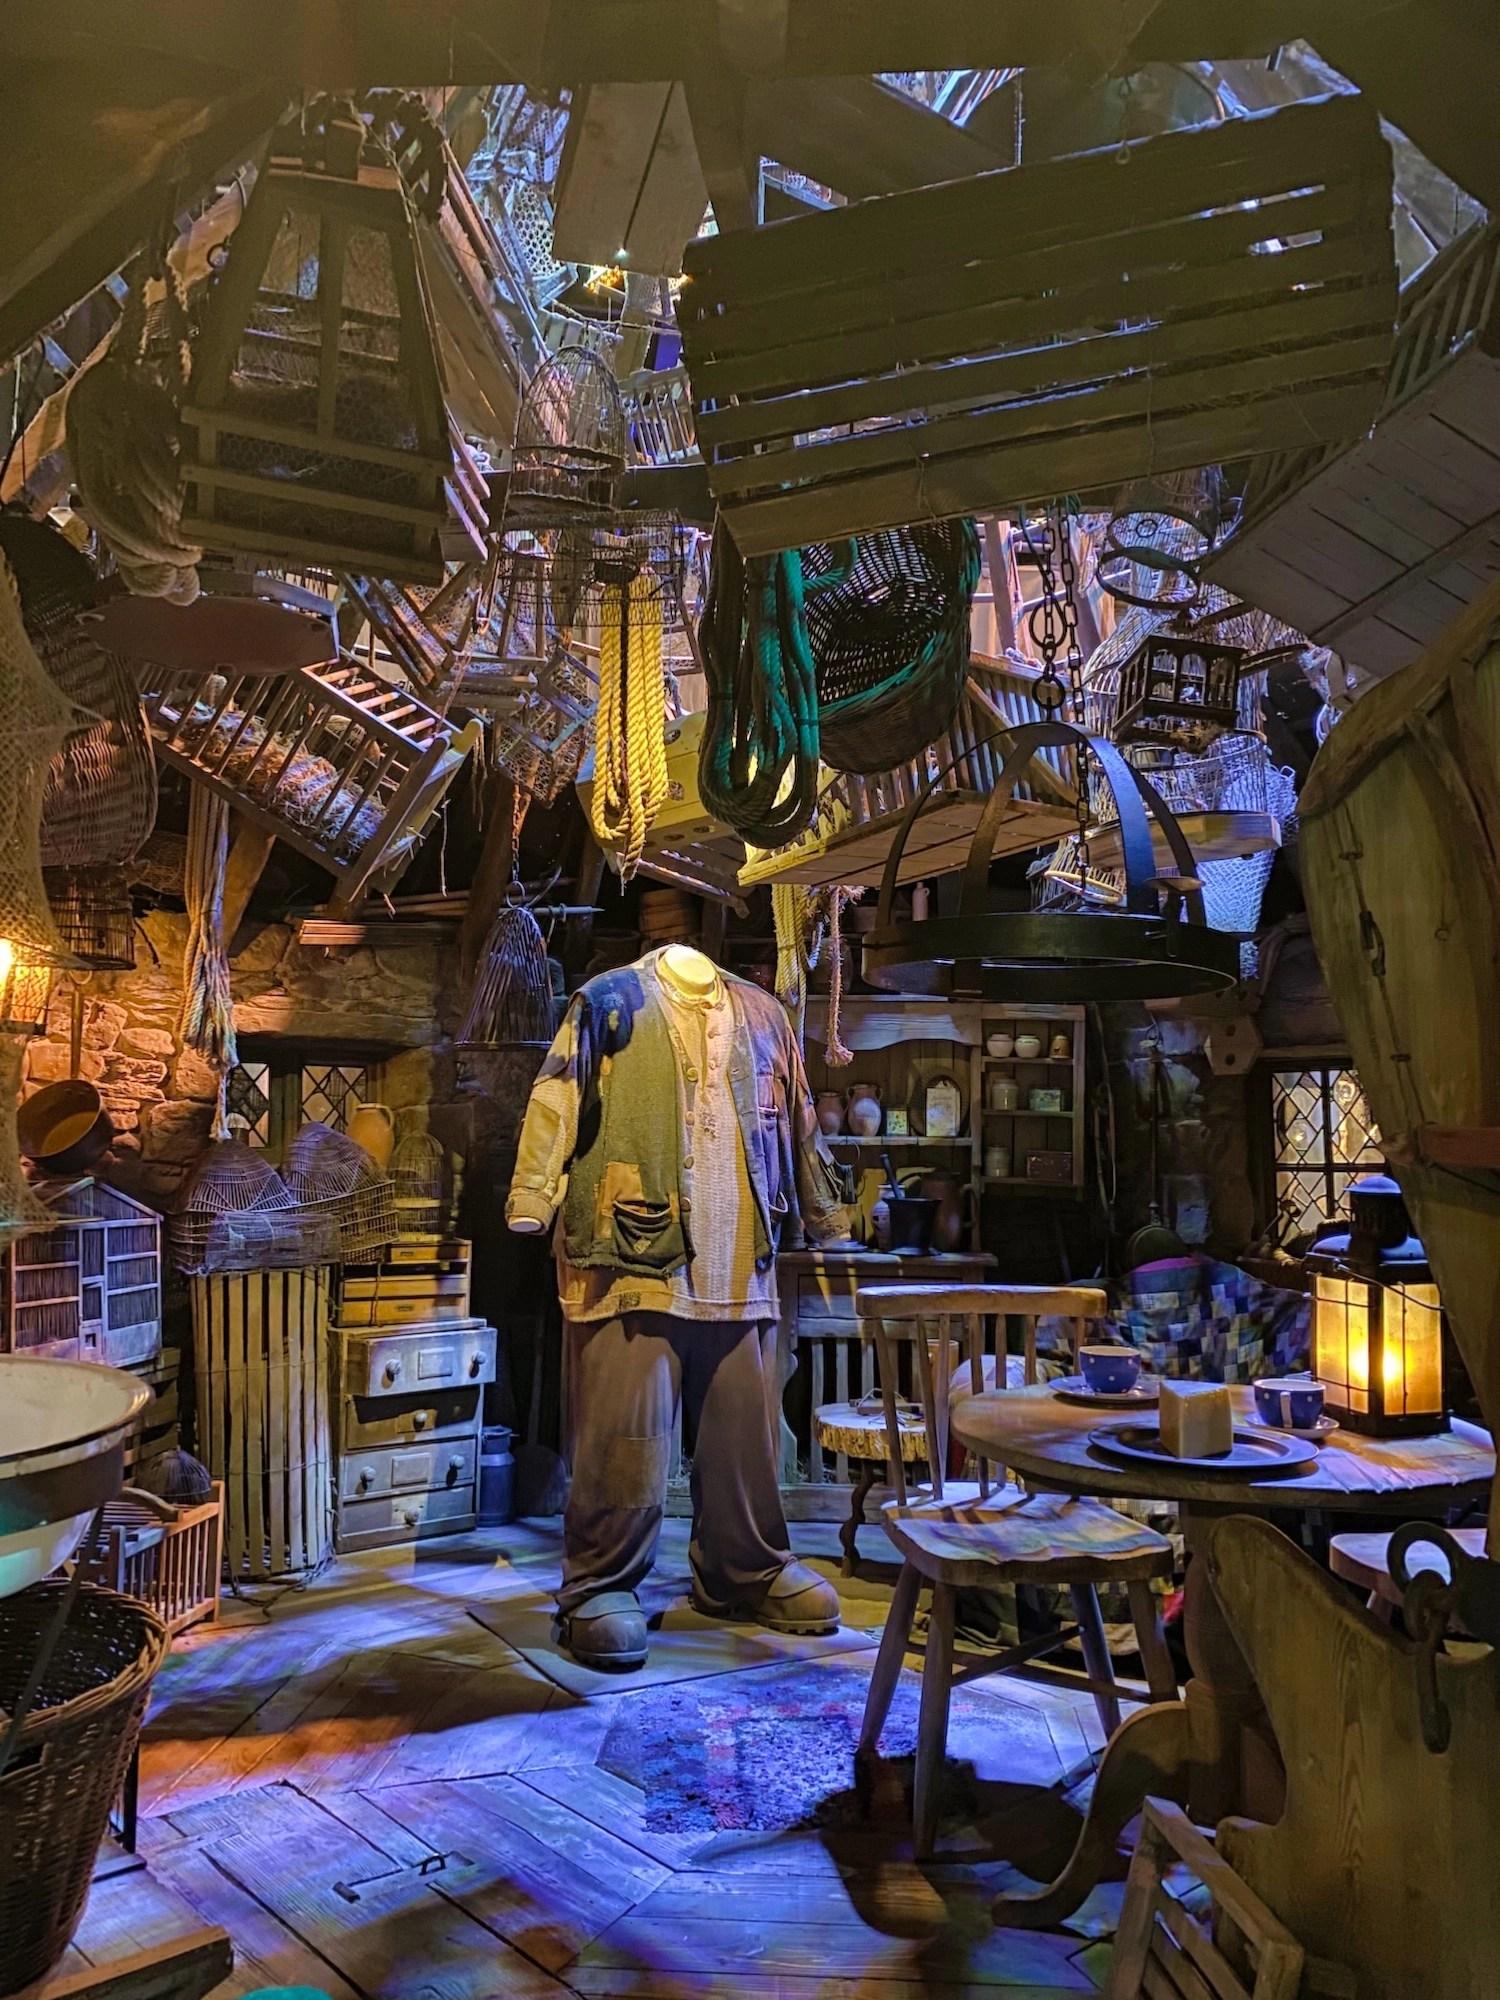 Harry Potter Studio Tour - Hagrid's Hut